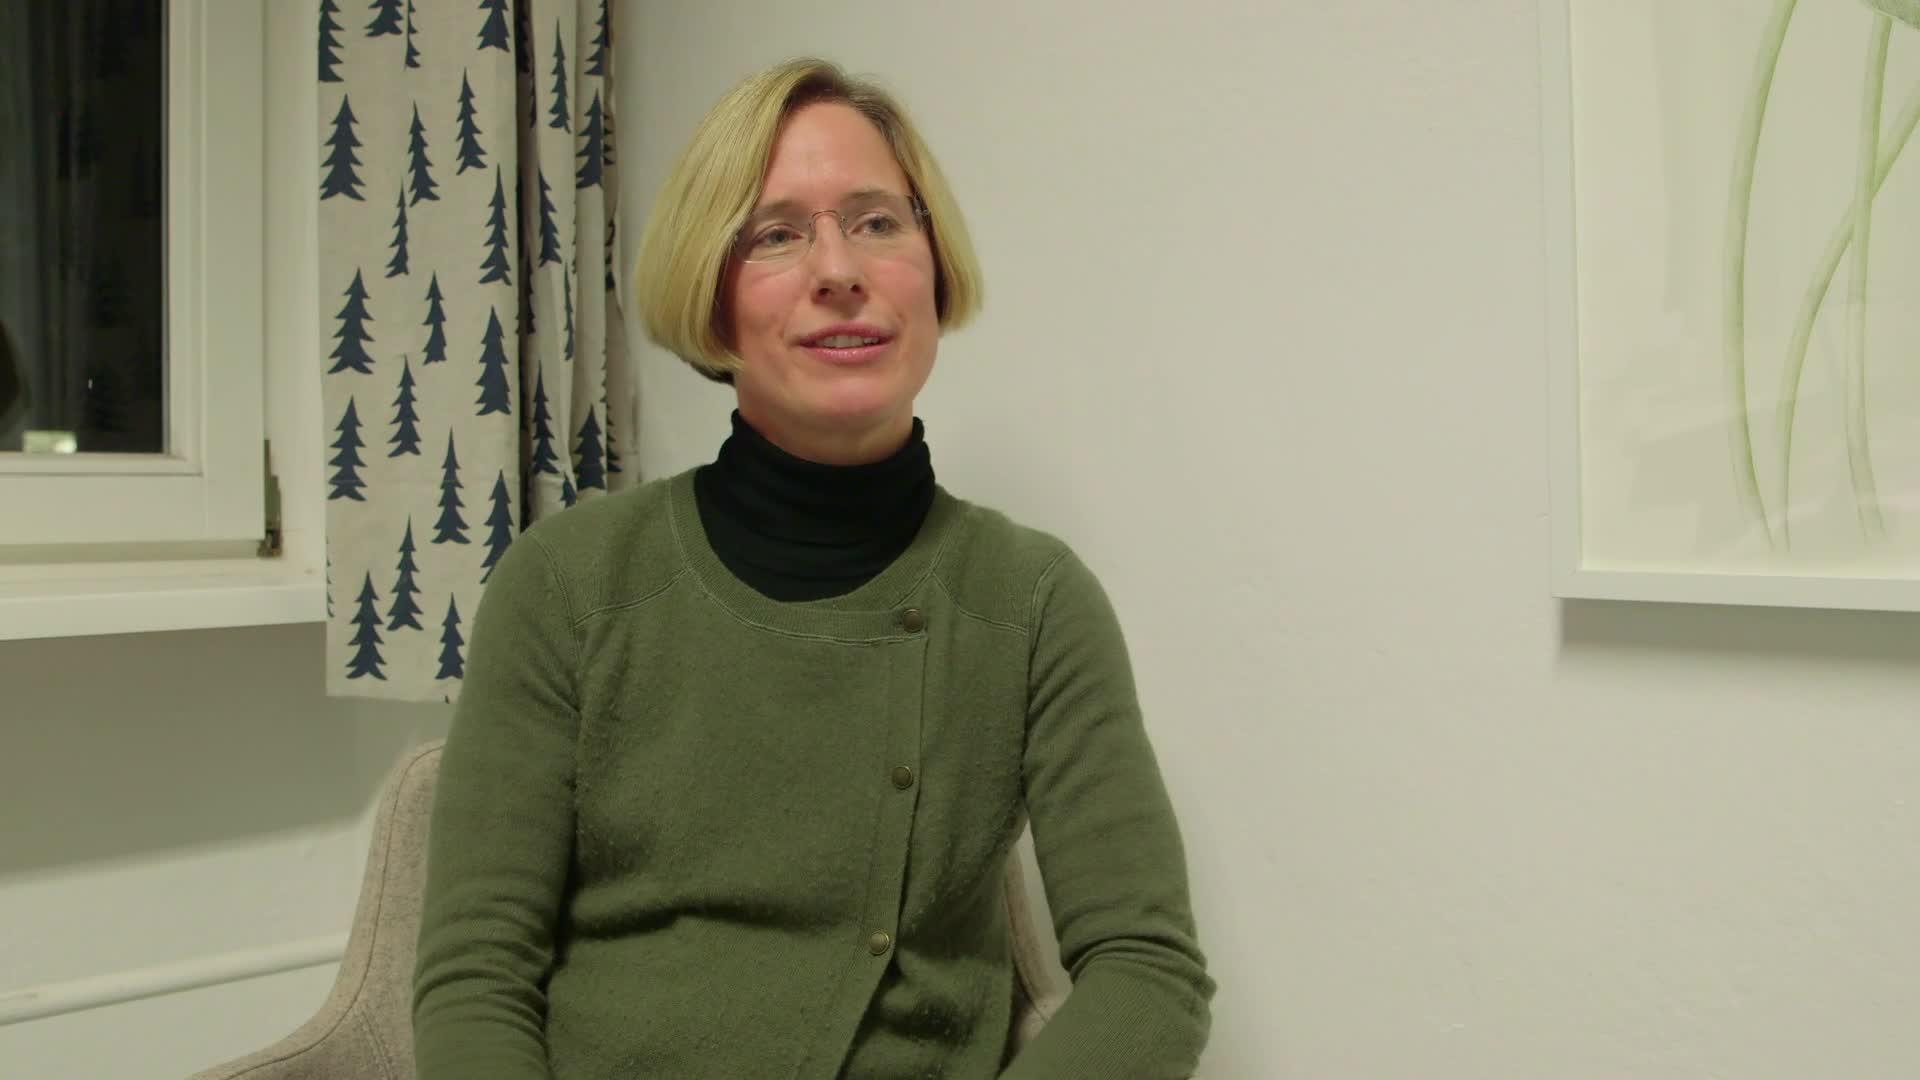 Prof. Dr. Hanna Eglinger - Skandinavische Gegenwartsliteratur preview image